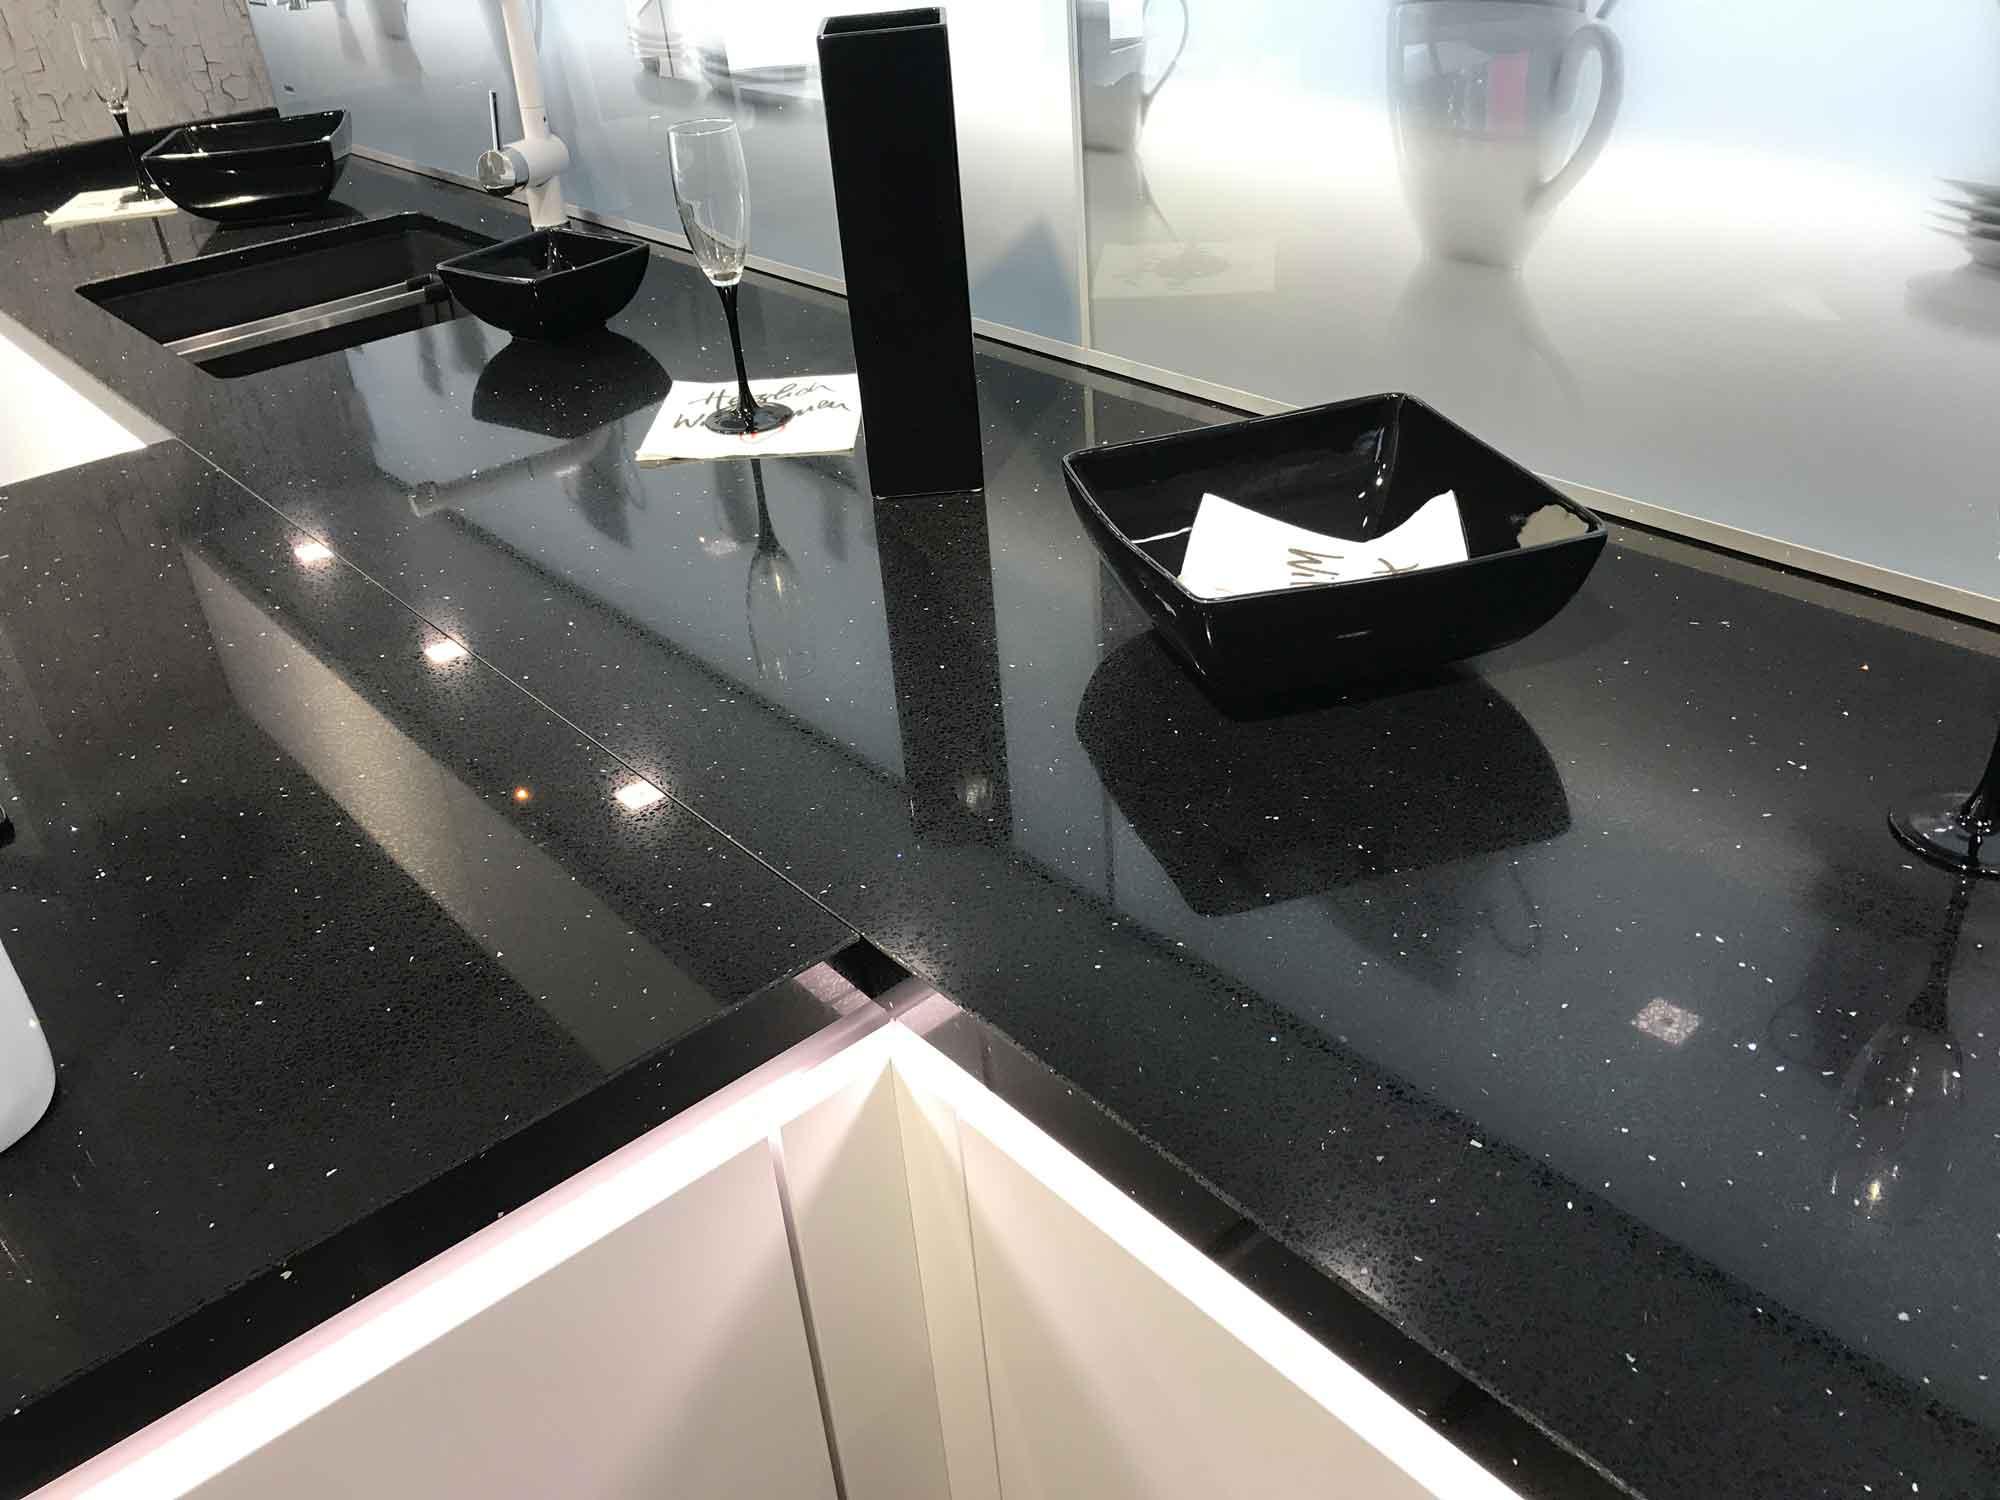 Glitzer quarz black star arbeitsplatte arbeitsplatten k chenarbeitsplatten - Quarzkomposit arbeitsplatte ...